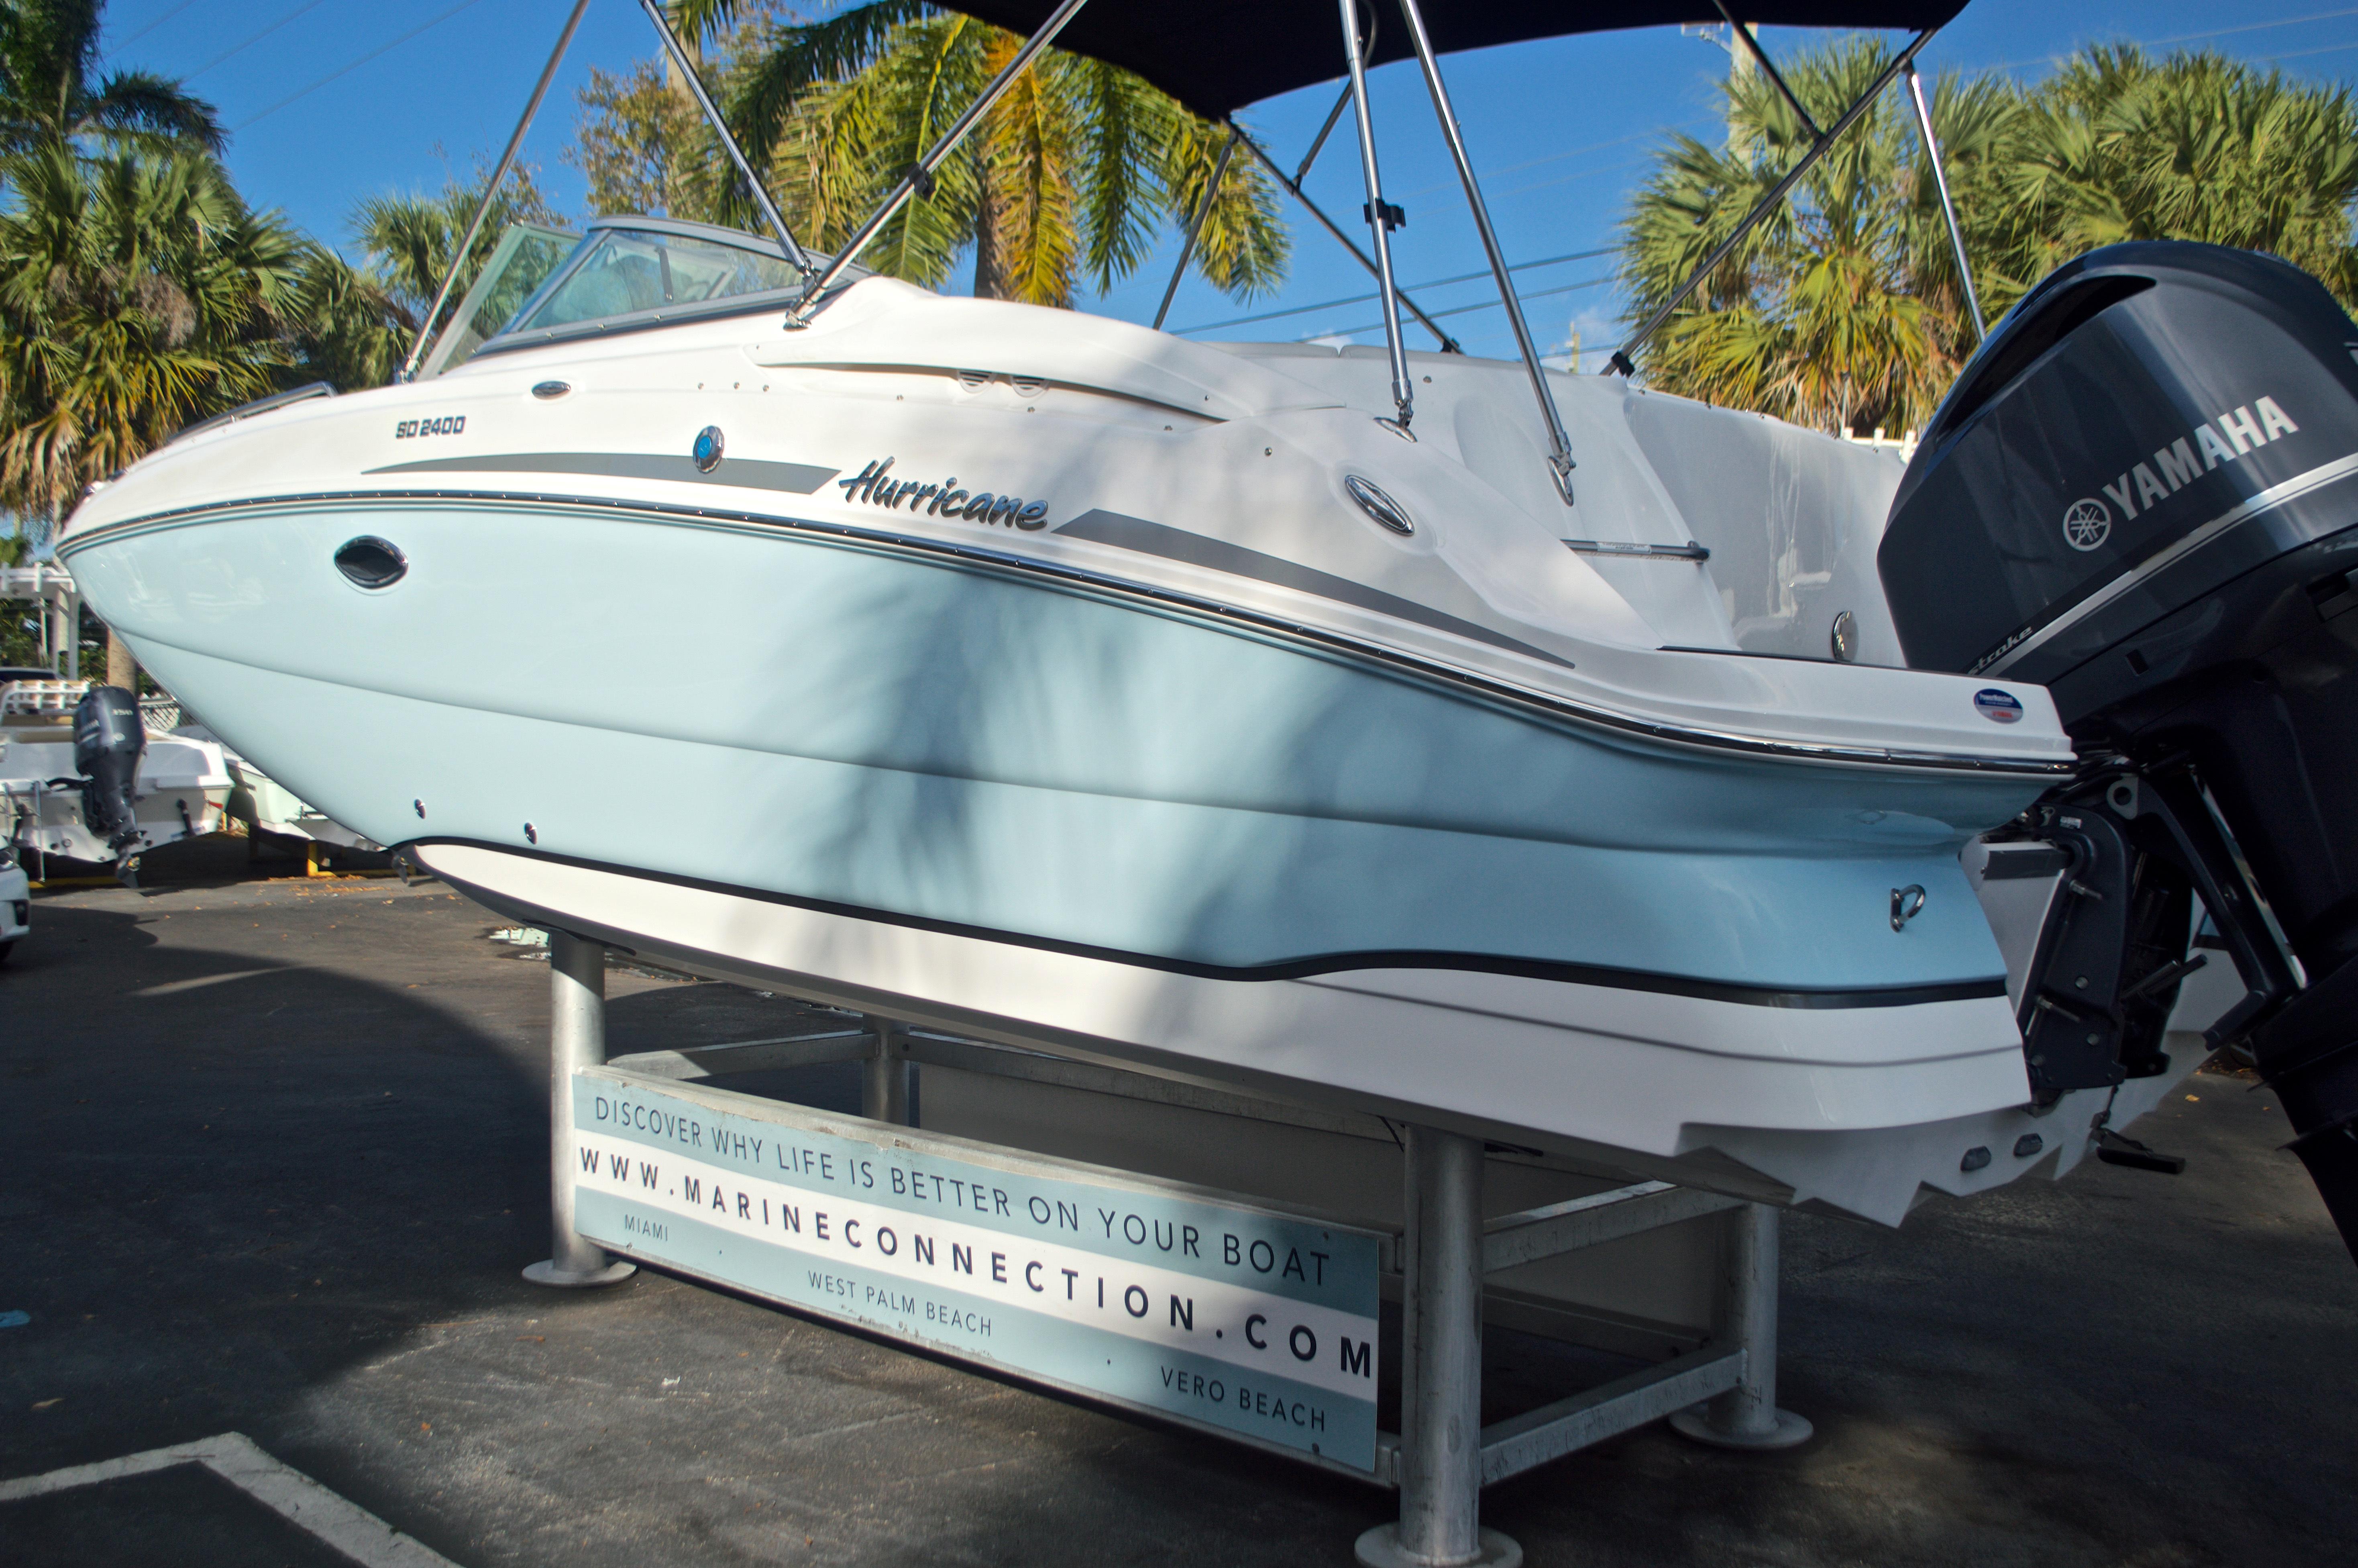 Thumbnail 6 for New 2017 Hurricane SunDeck SD 2400 OB boat for sale in Miami, FL